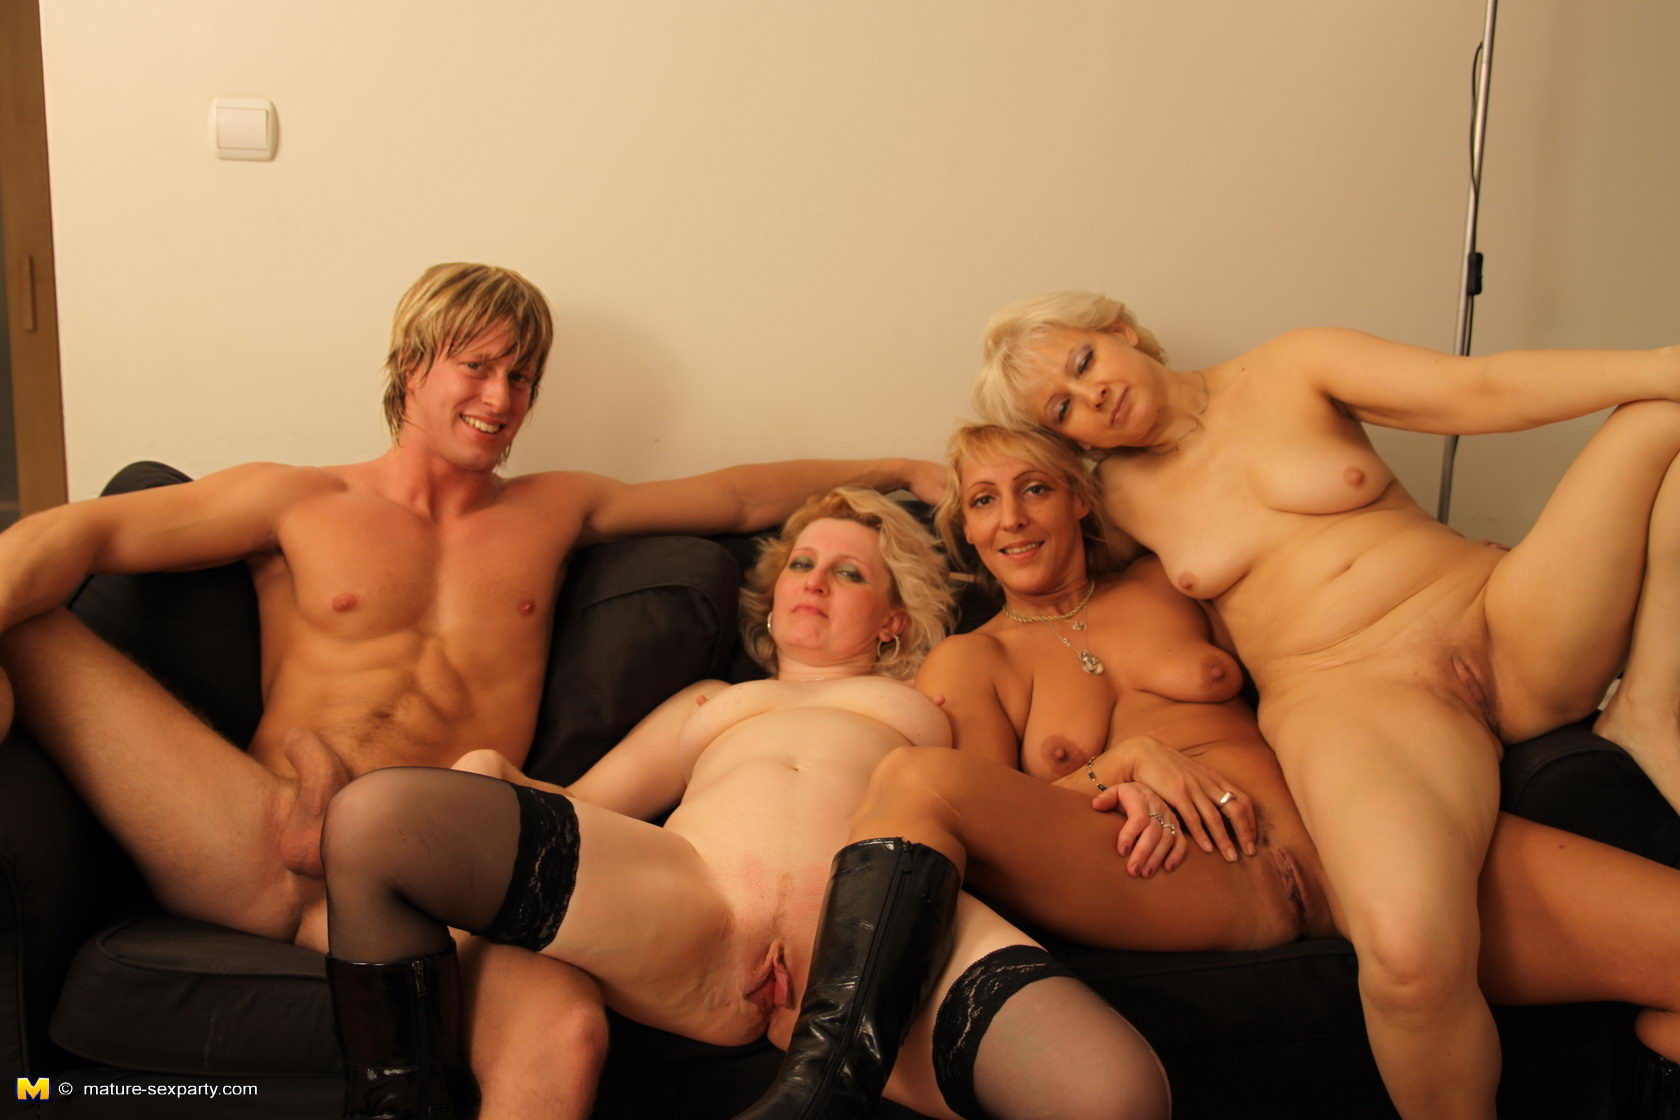 image Mature dude gets a bj at his gay massage